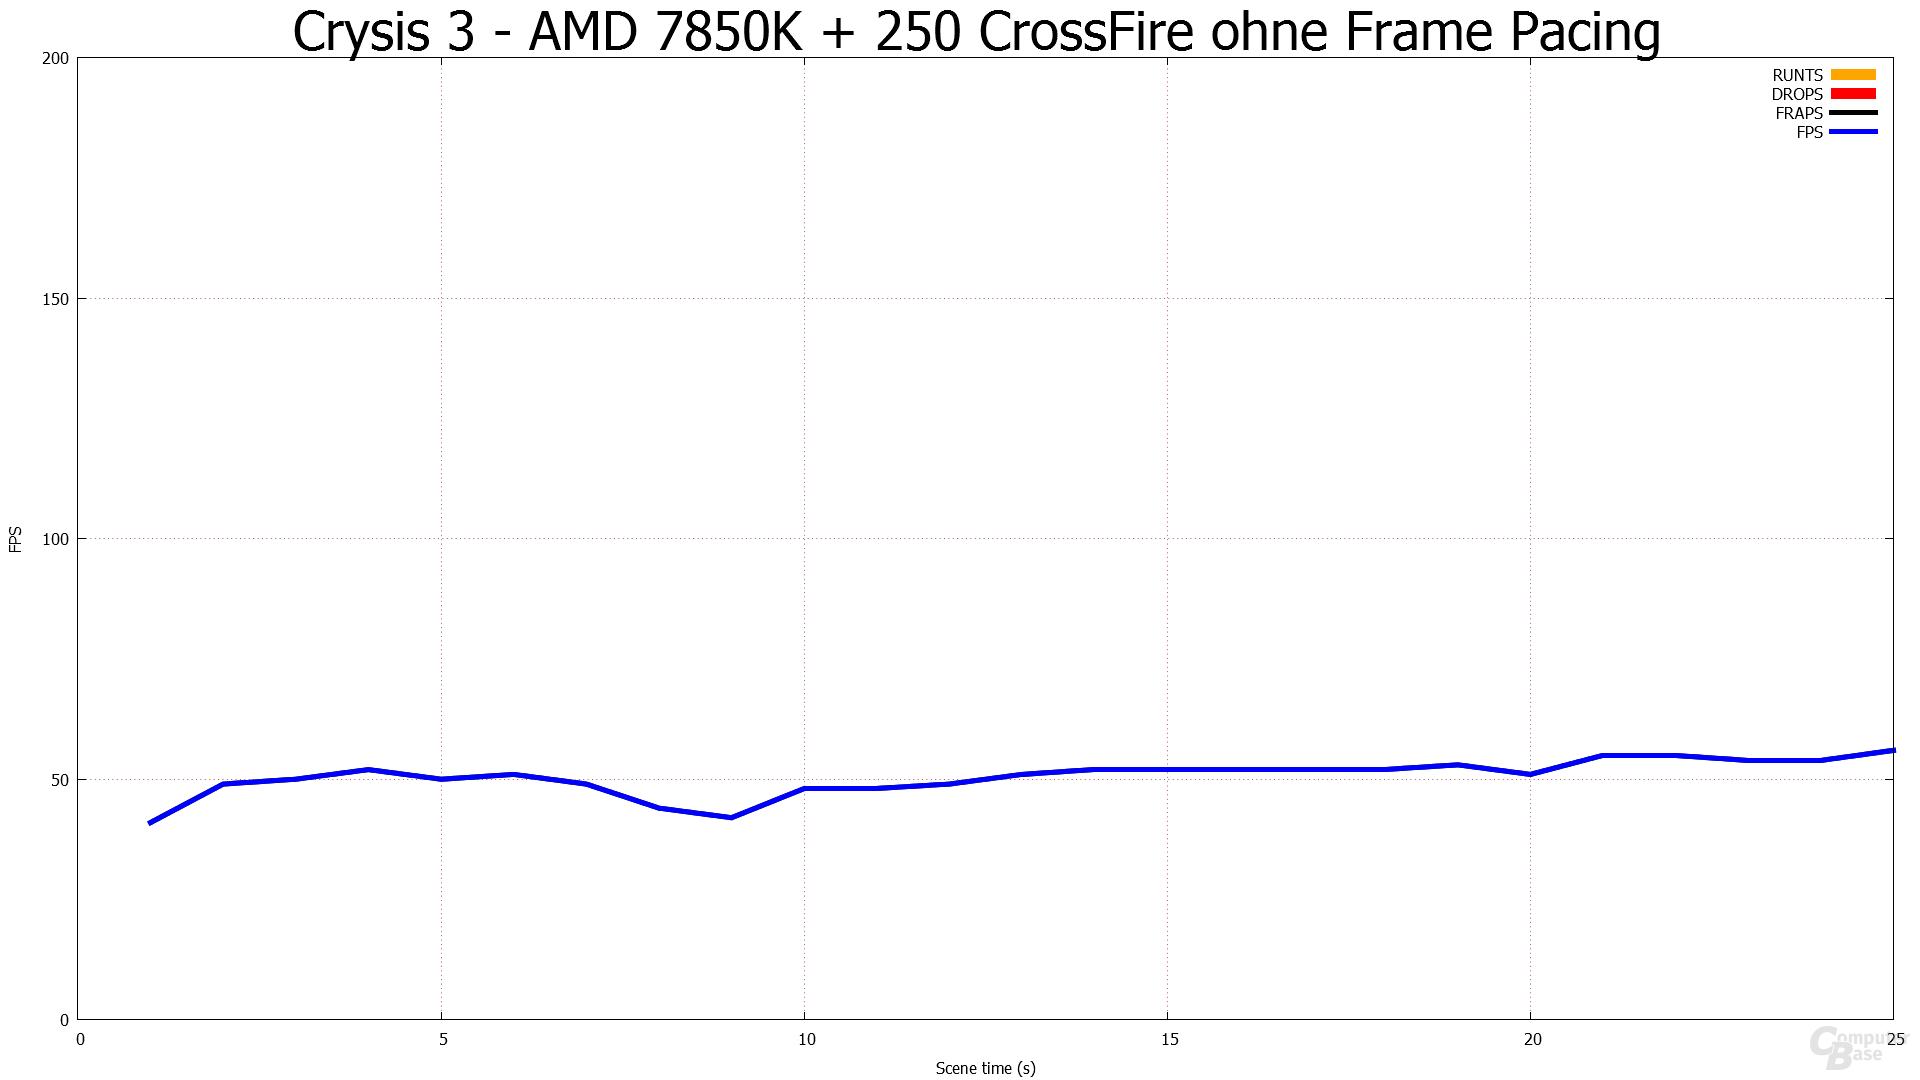 Ohne Frame Pacing - Crysis 3